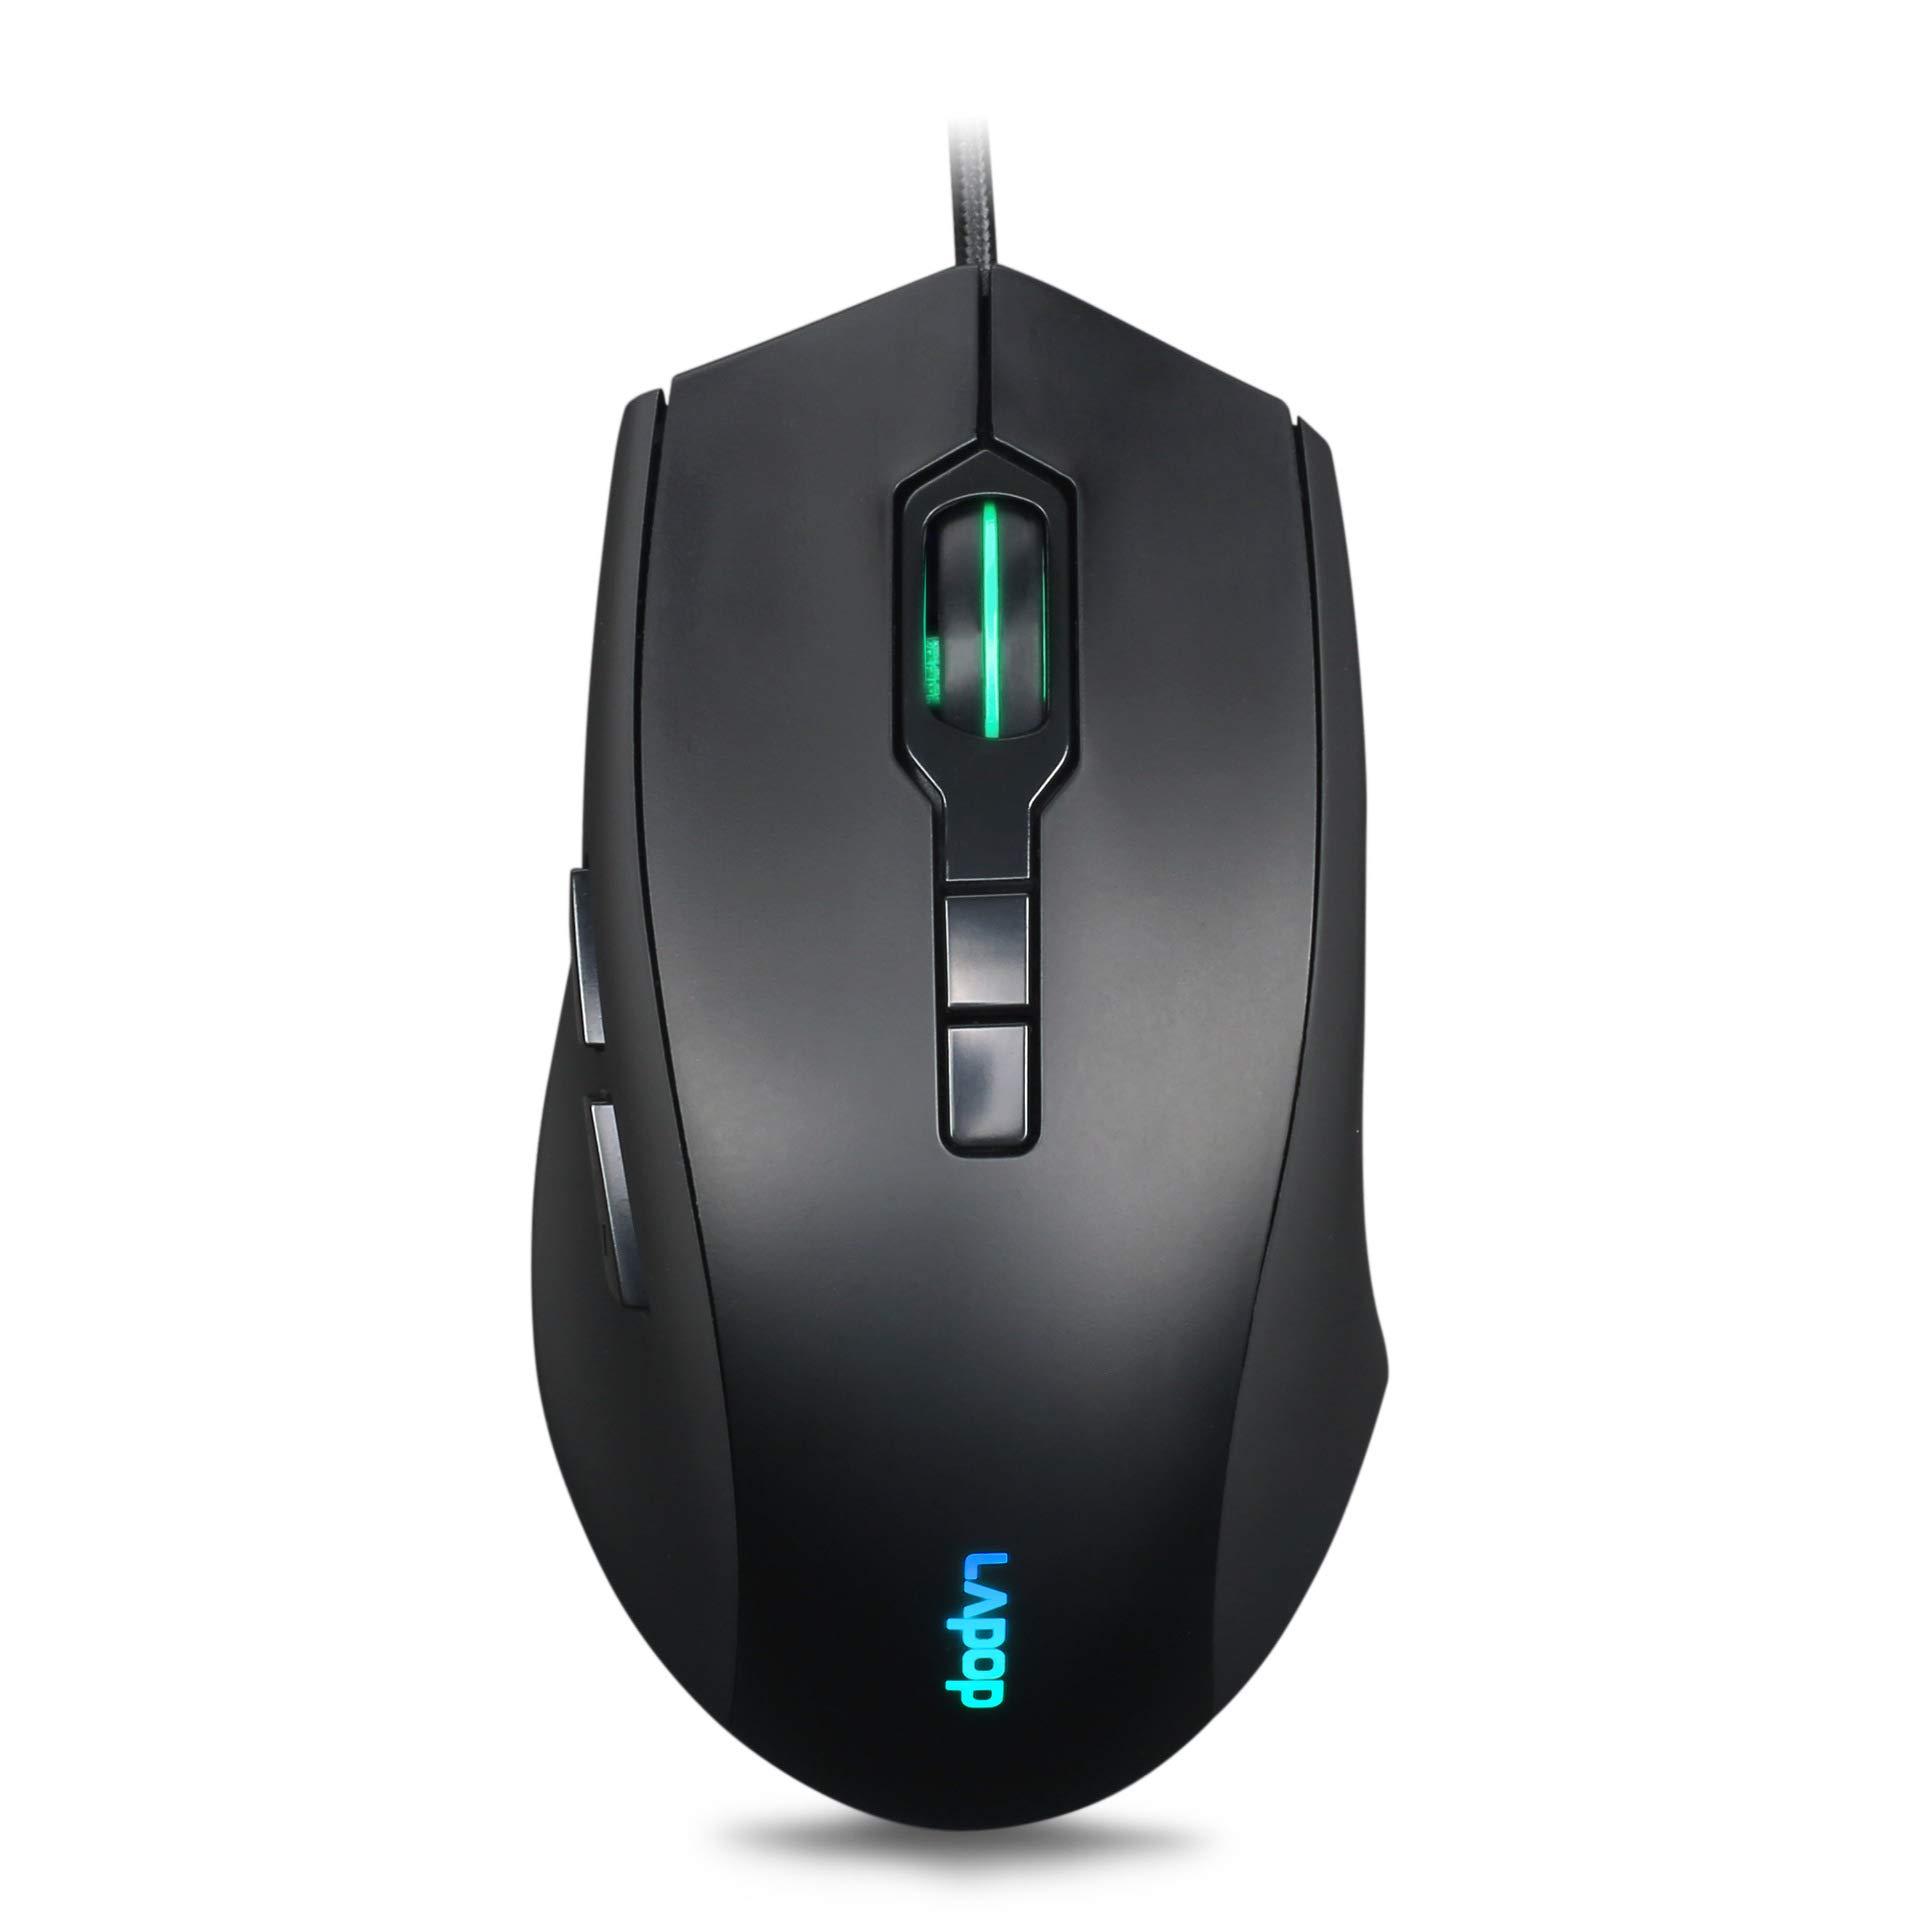 Mouse Gamer : RGB 3200 DPI Con cable Optico con RGB Backlit